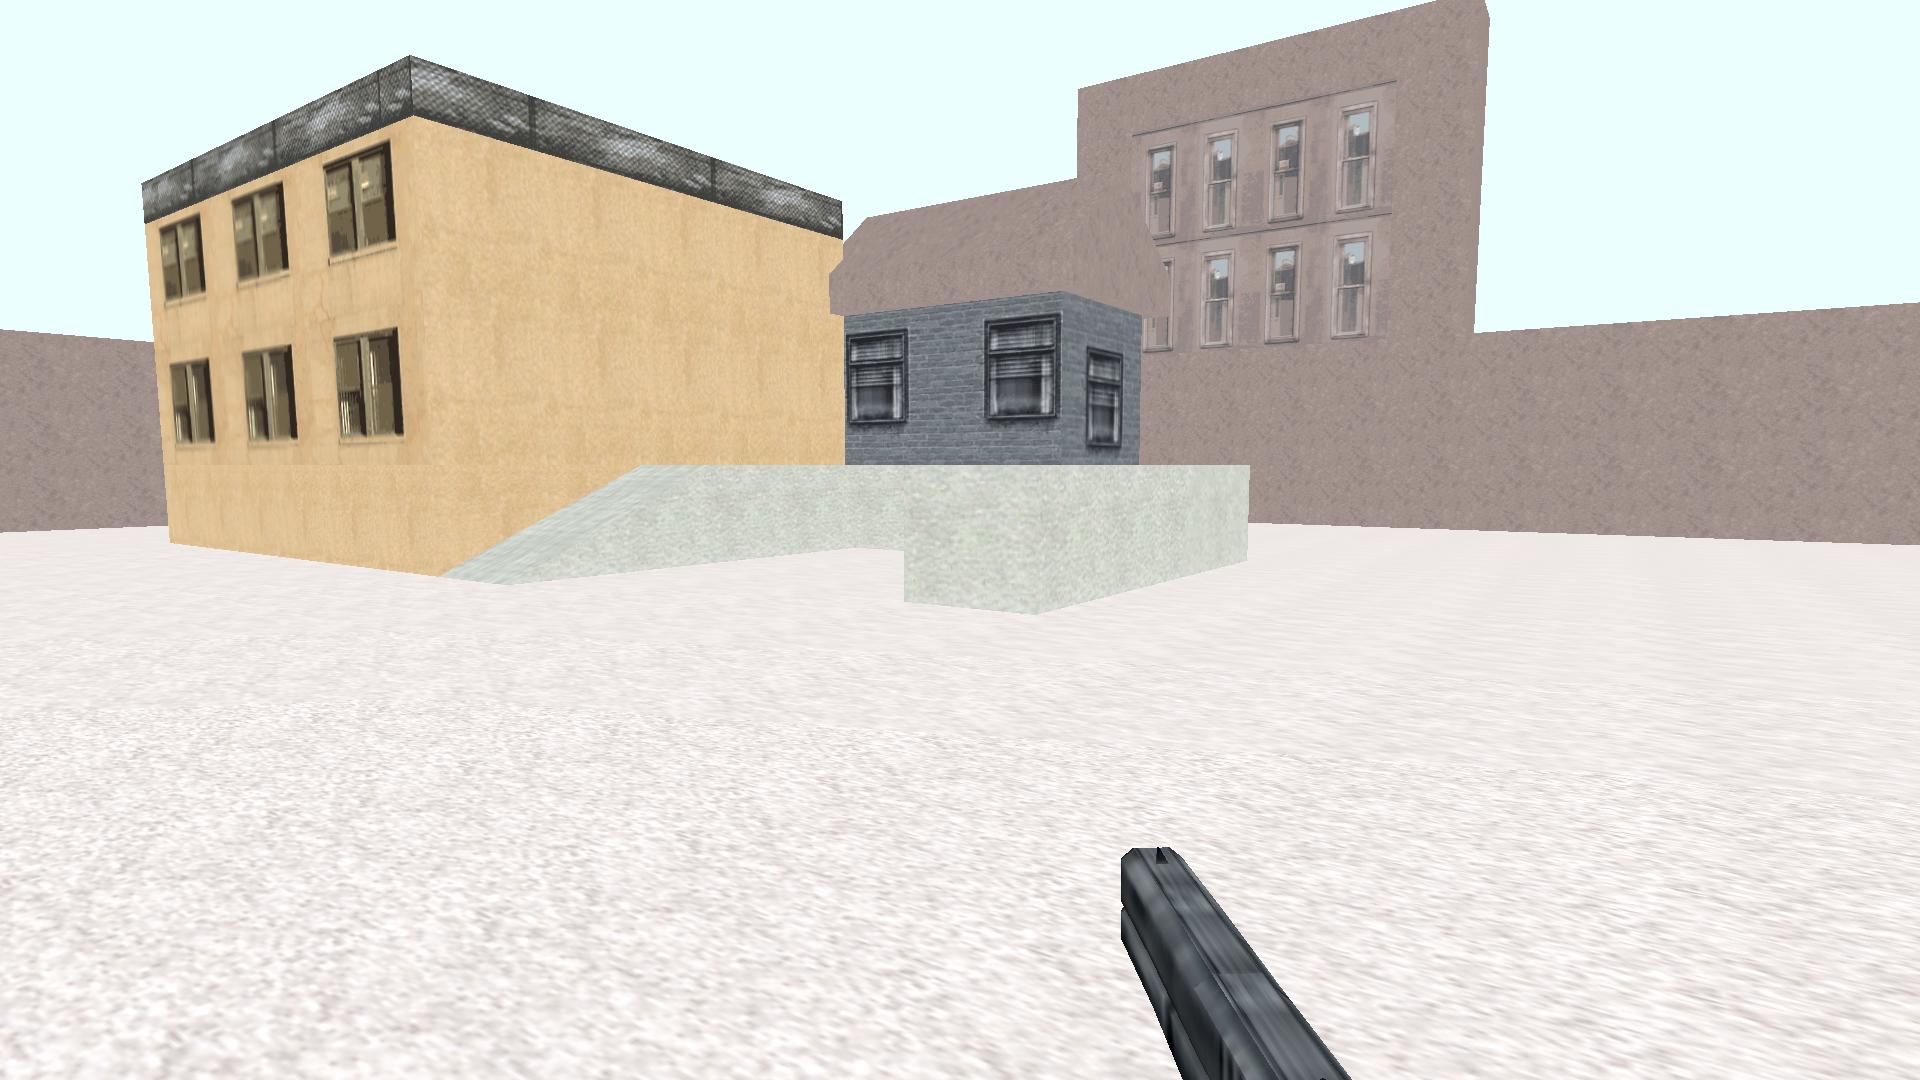 city_demo0000.jpg - Half-Life 2